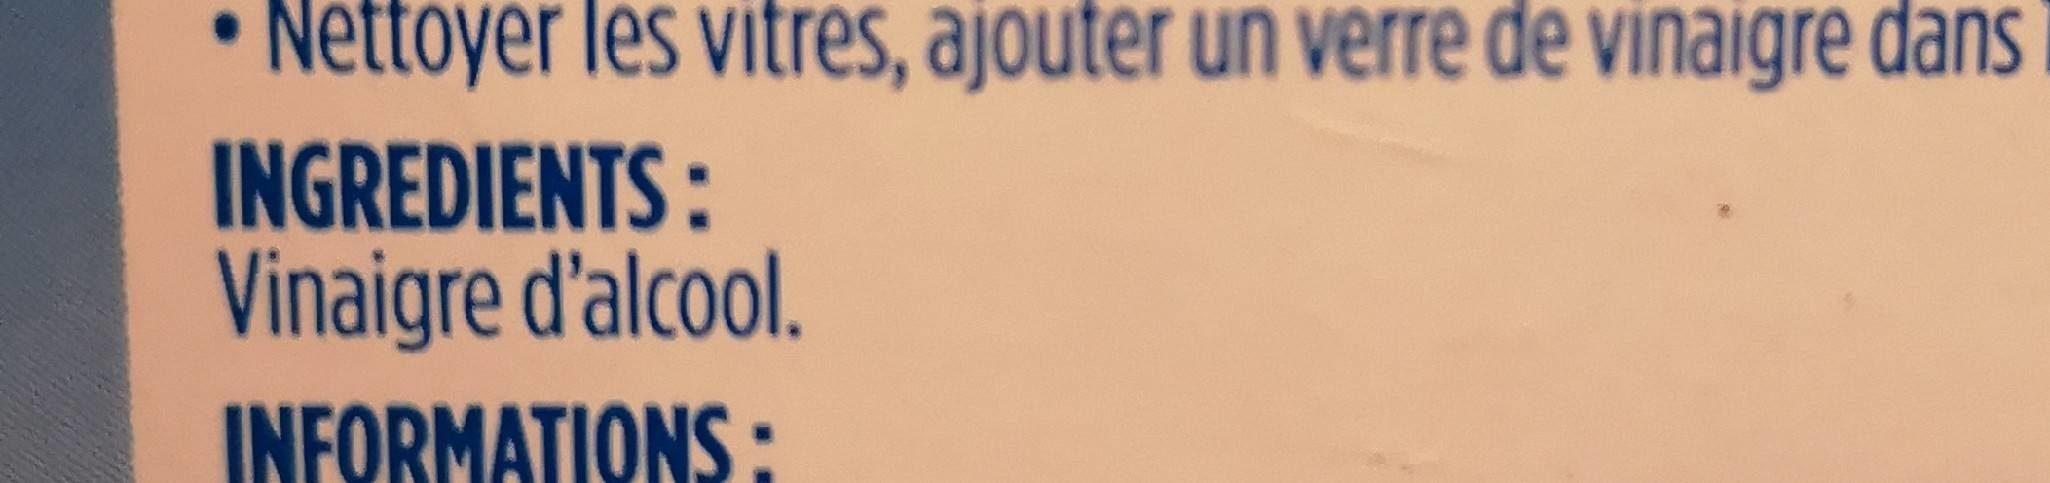 Vinaigre d'alcool cristal - Ingrediënten - fr